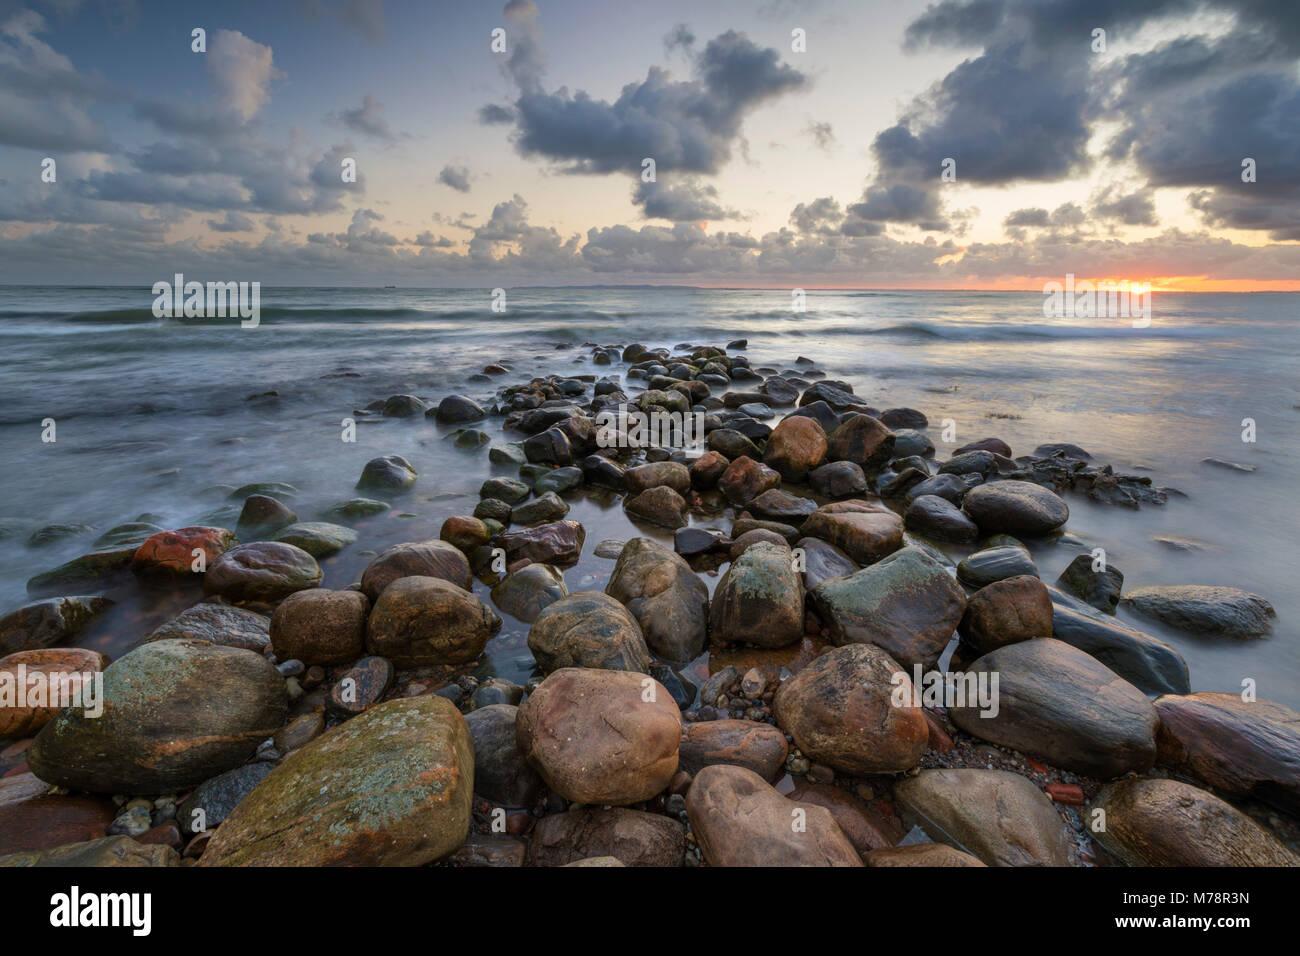 Rock Wellenbrecher im Meer bei Sonnenaufgang, Munkerup, Kattegat Coast, Neuseeland, Dänemark, Skandinavien, Stockbild